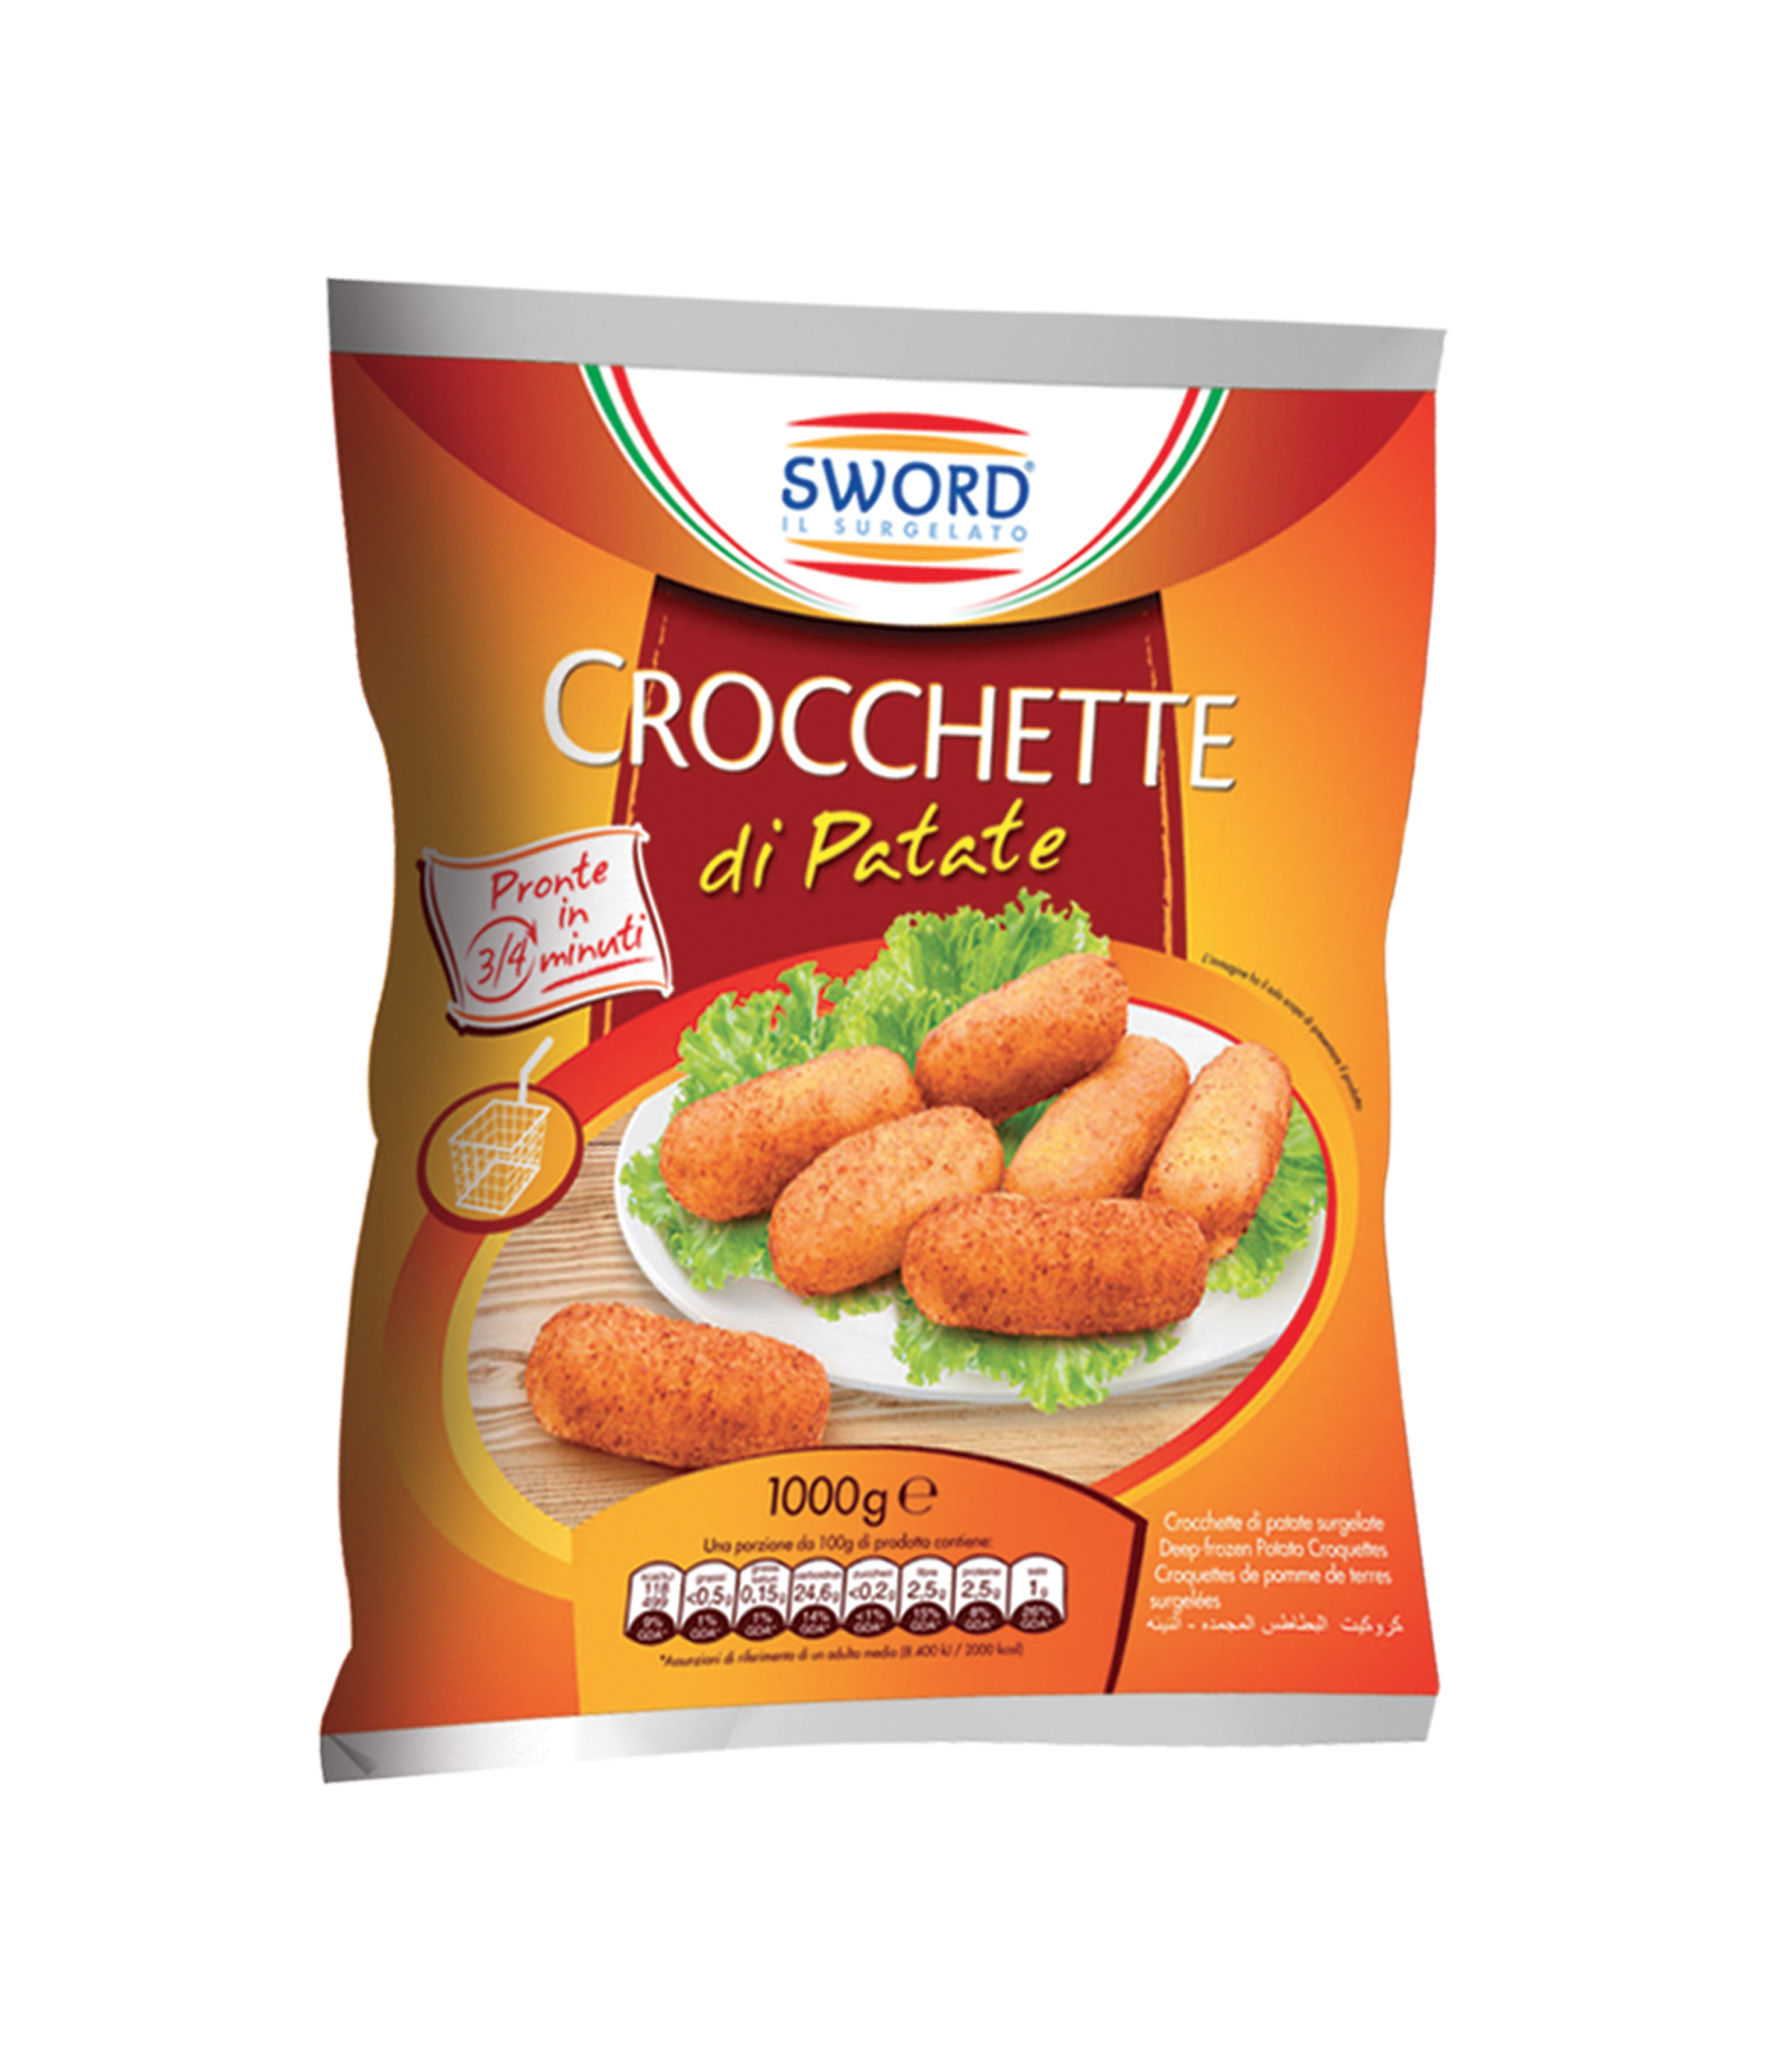 Crocchette